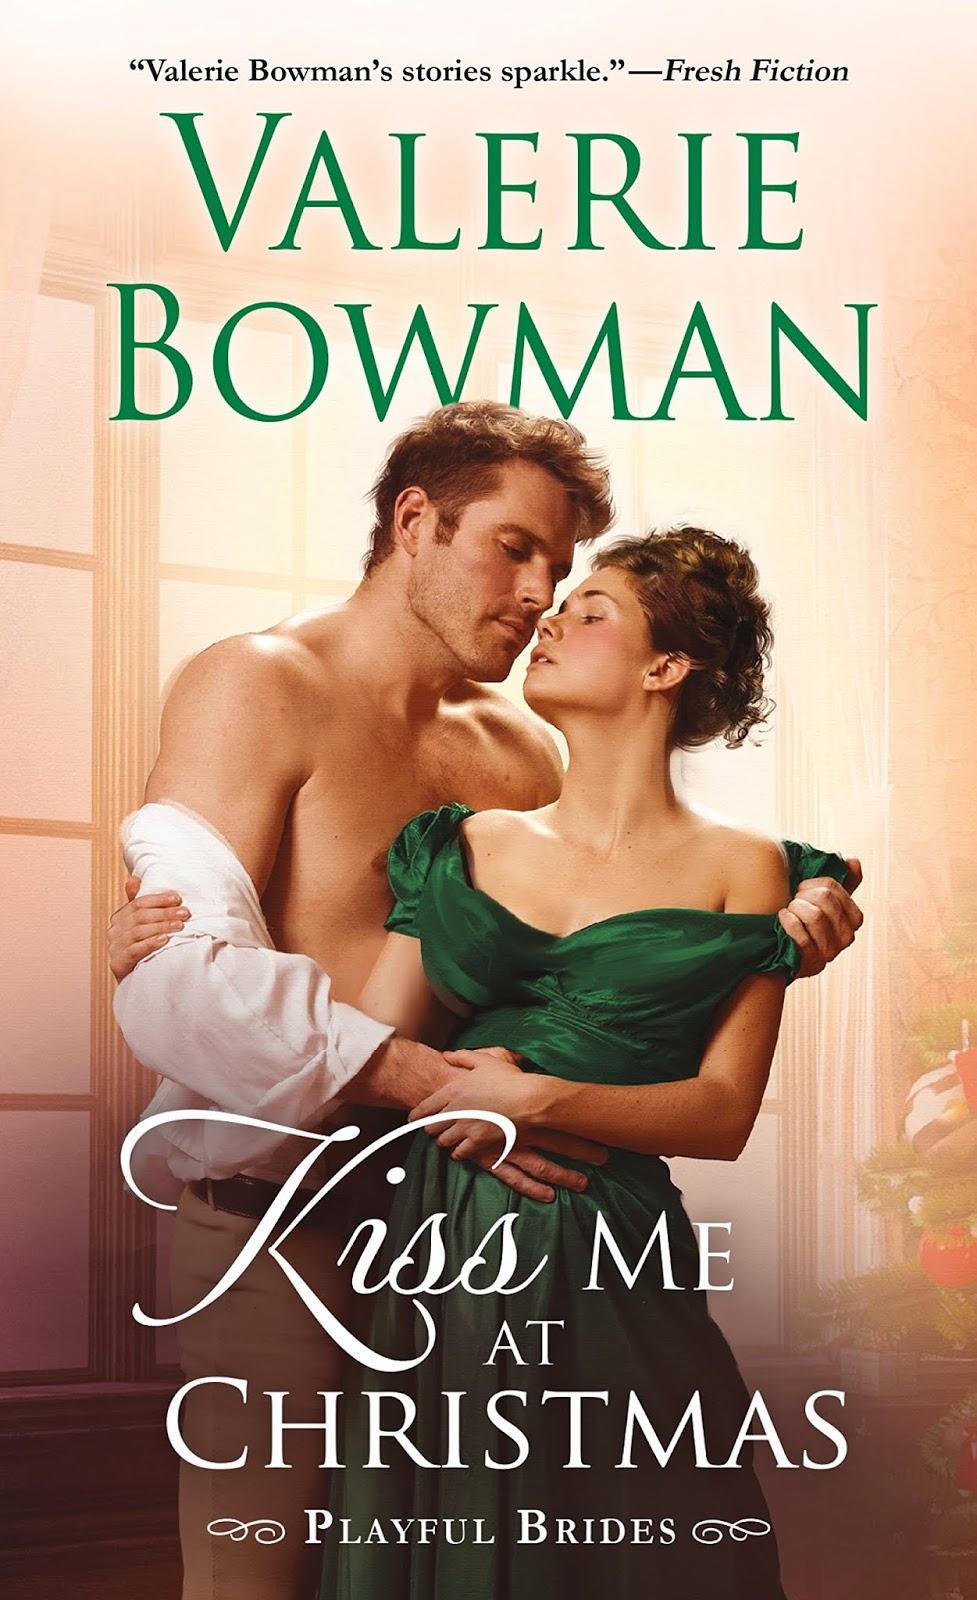 That November Weekend: A Romance Novel